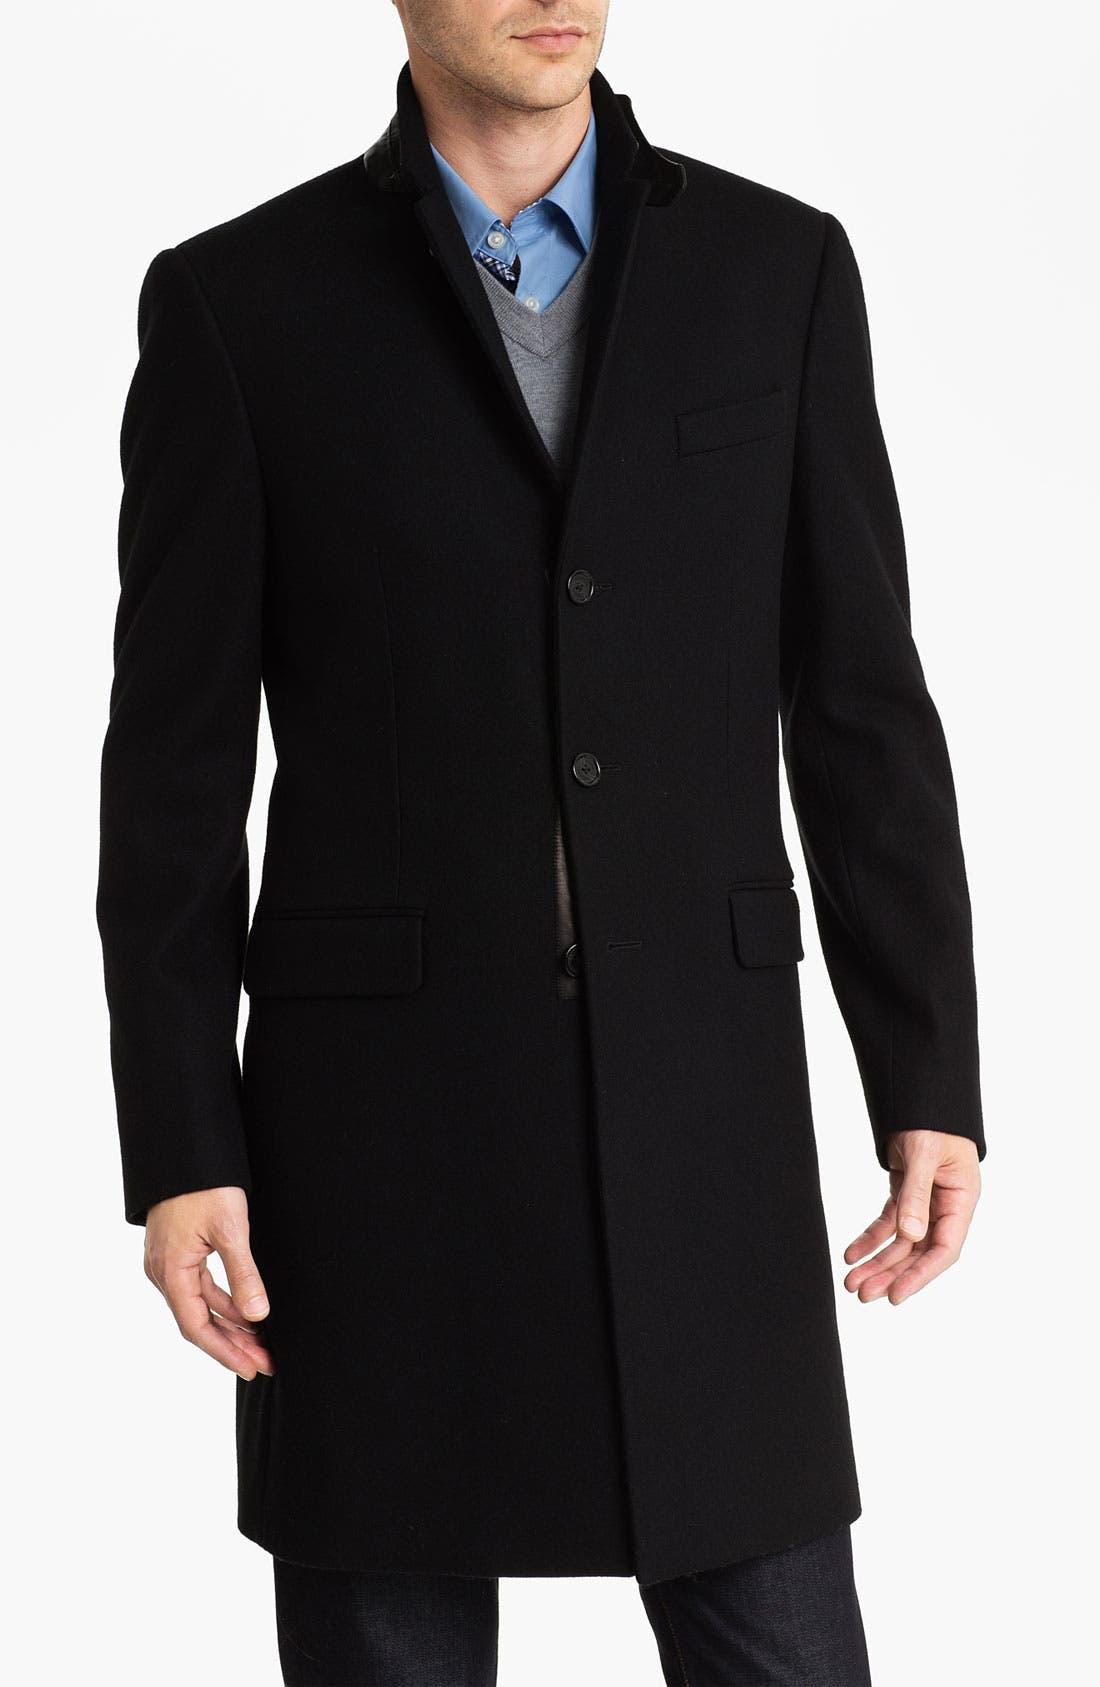 Main Image - Michael Kors Melton Topcoat with Leather Trim